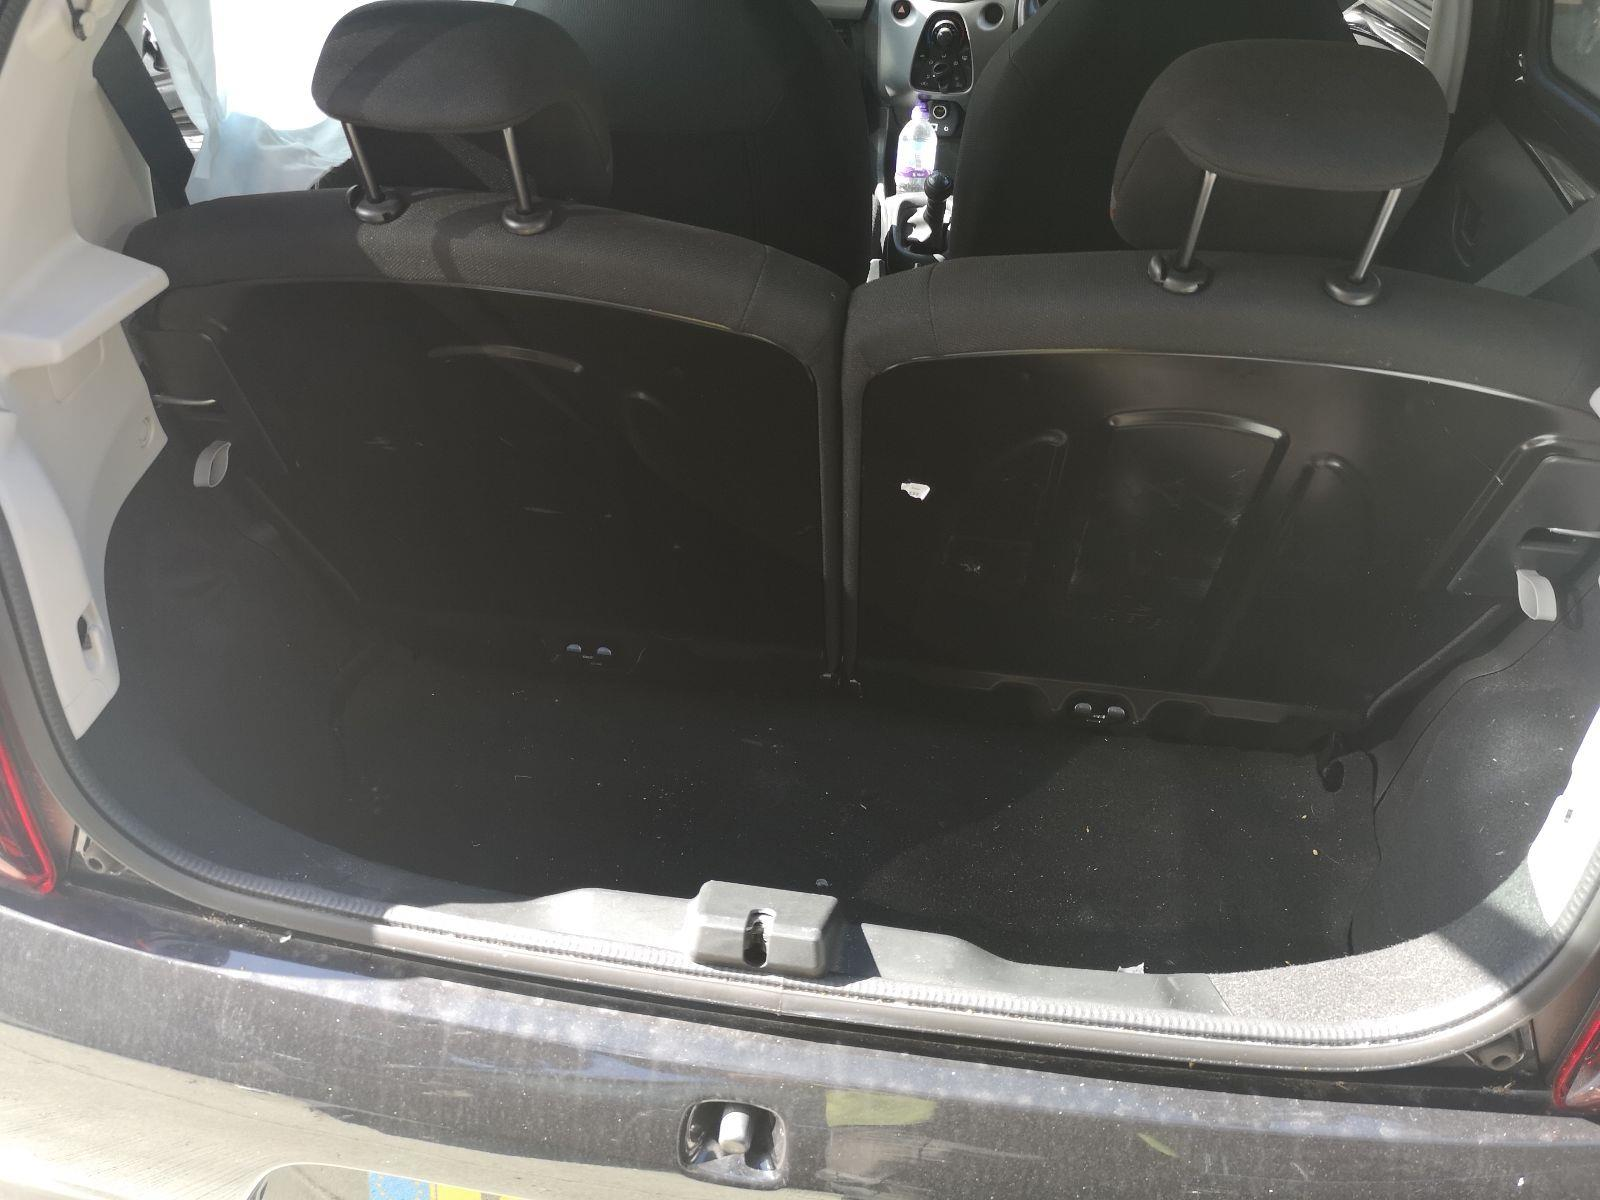 Peugeot 108 2014 On Active Vti 68 5 Door Hatchback Scrap Salvage 306 Fuse Box Brake Lights Year